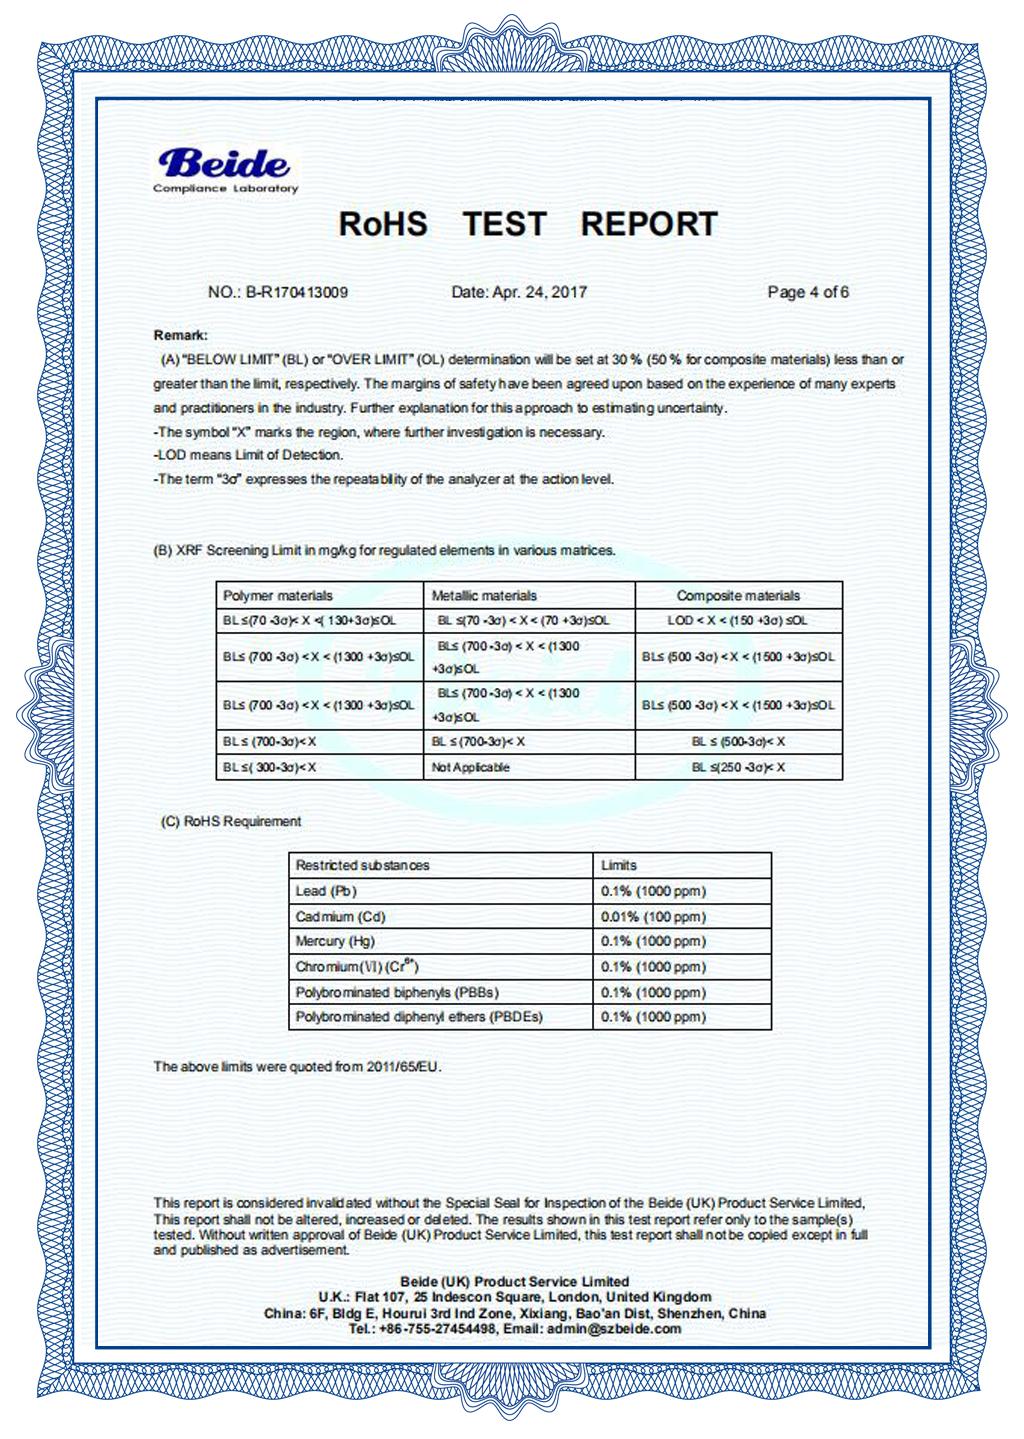 ROHS Report - RF Label